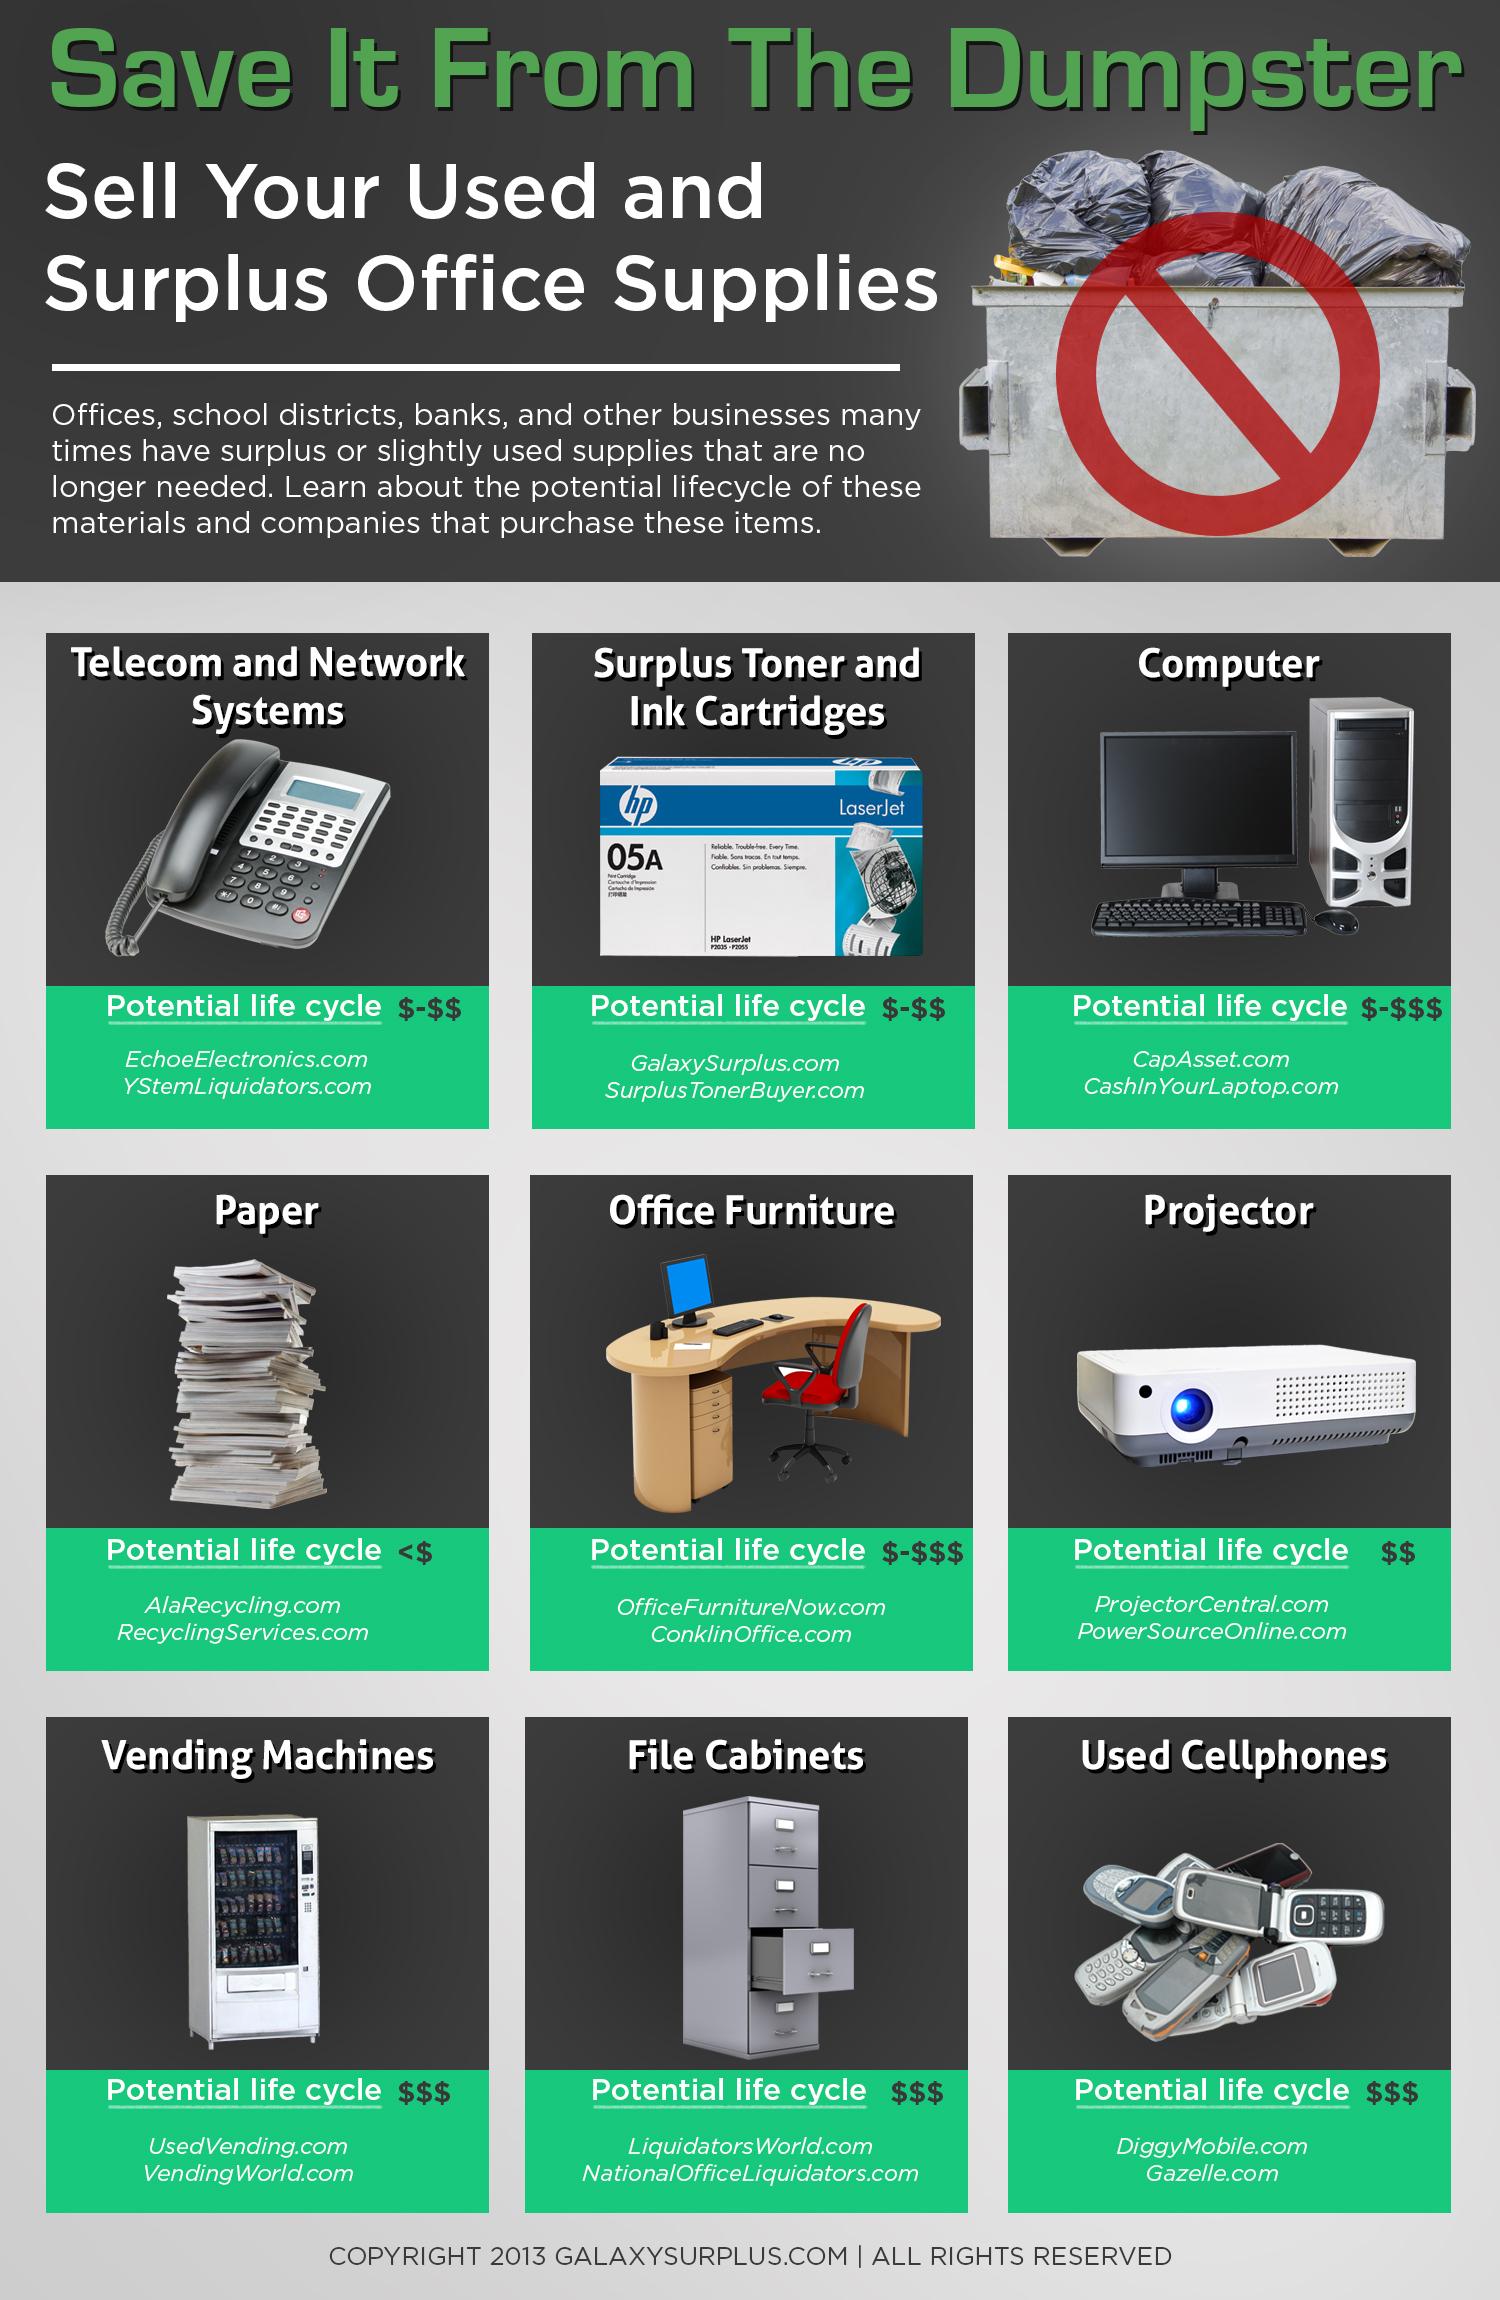 Your Surplus Office Supplies